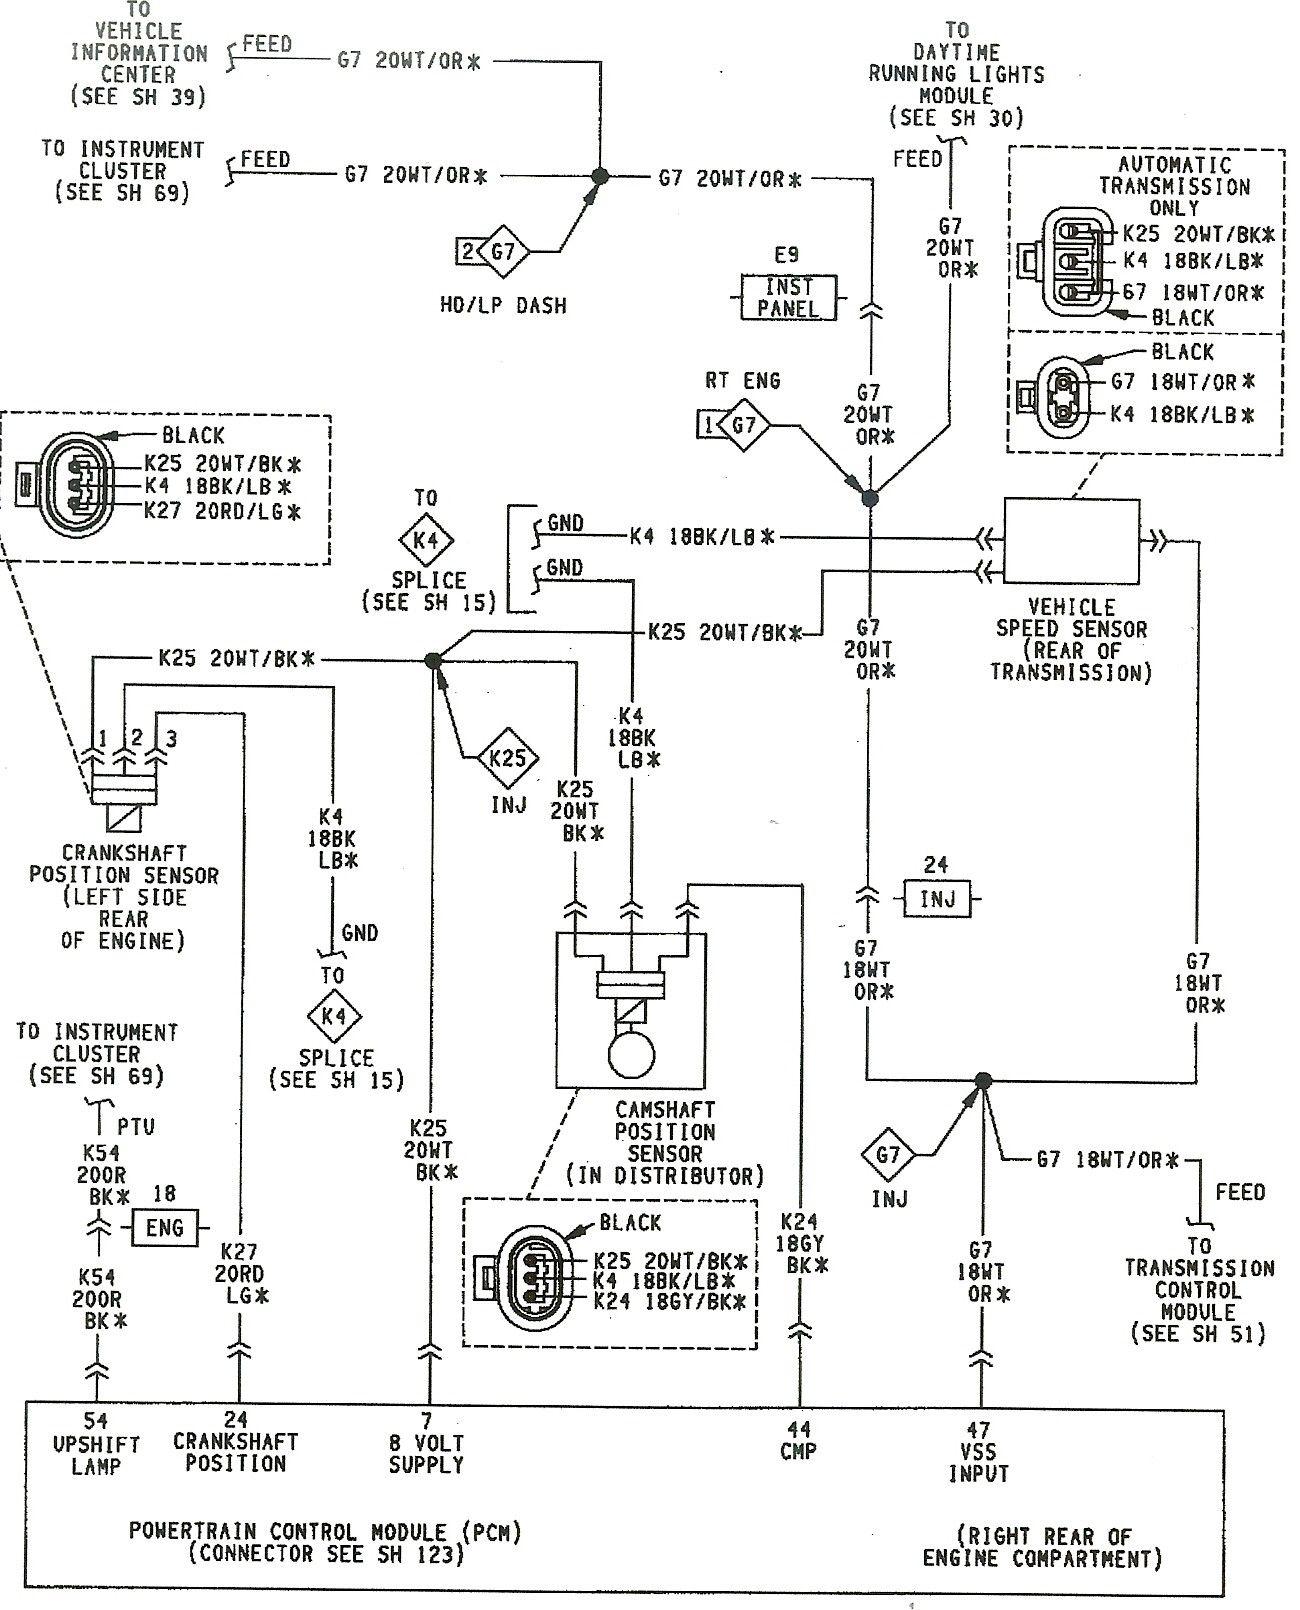 04 Jeep Grand Cherokee 4 0 Transfer Case Wiring Diagram Unique In 2020 Electrical Diagram Diagram Electrical Wiring Diagram